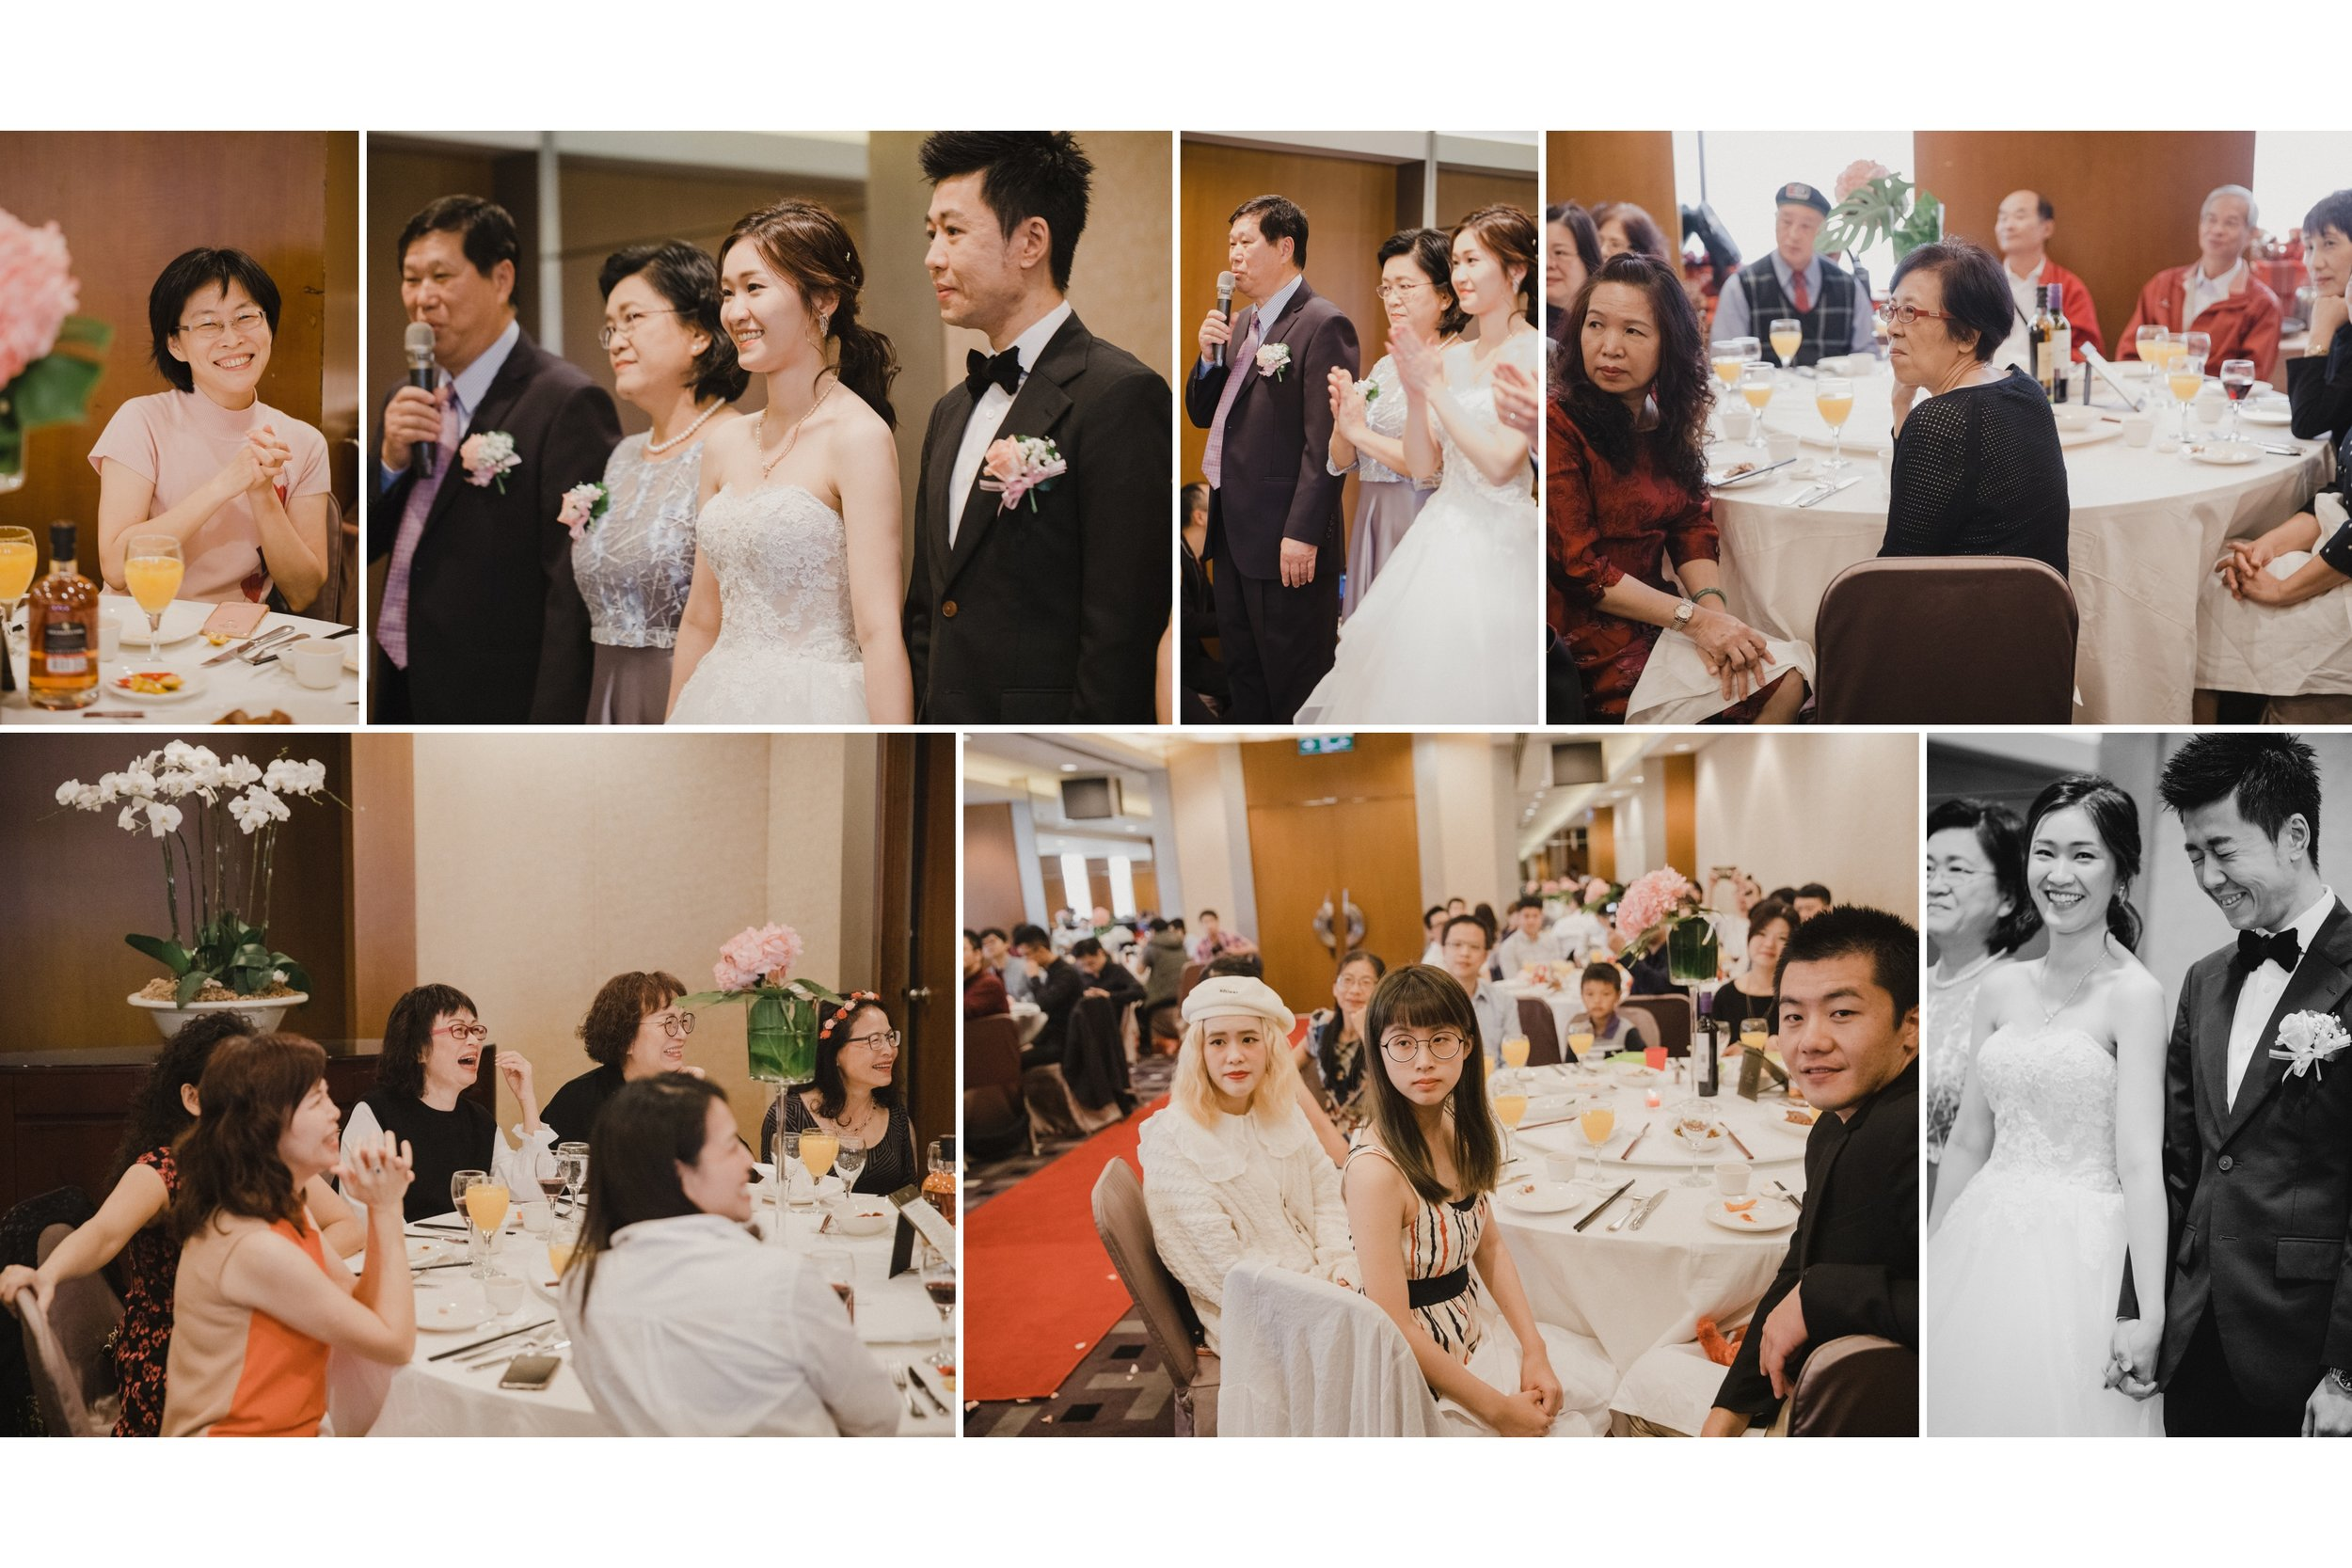 wedding-caridee-oscar-lunch-ambassador-hsinchu-結婚午宴-新竹國賓_85.jpg